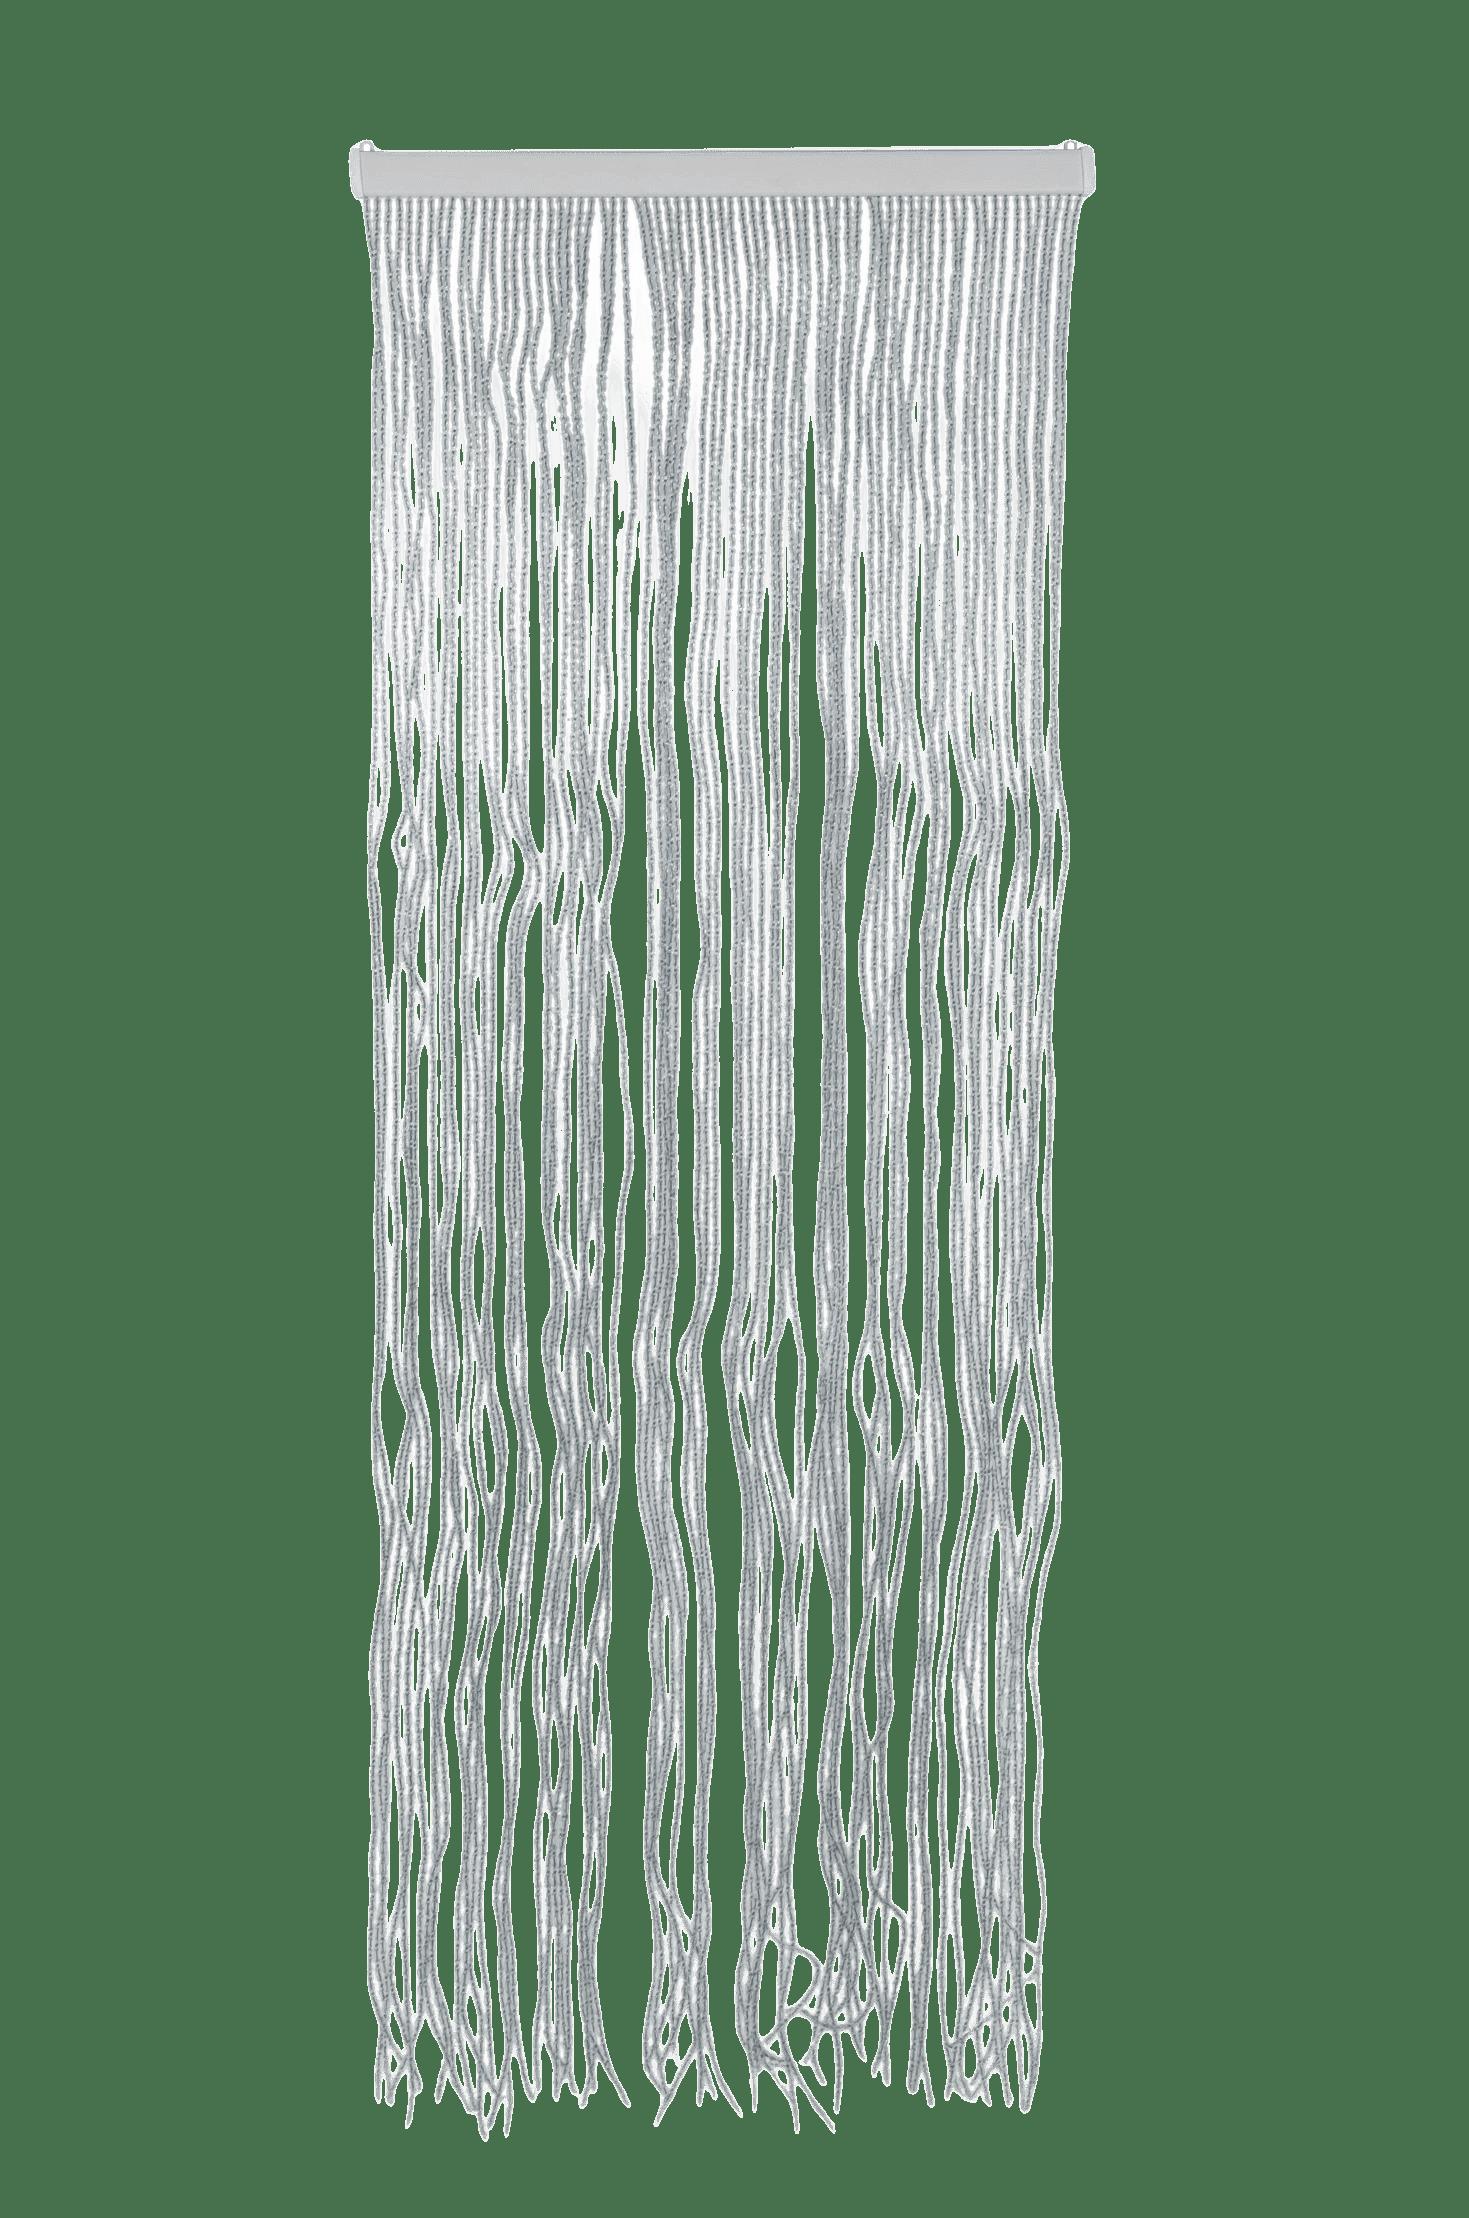 Vliegengordijn pvc